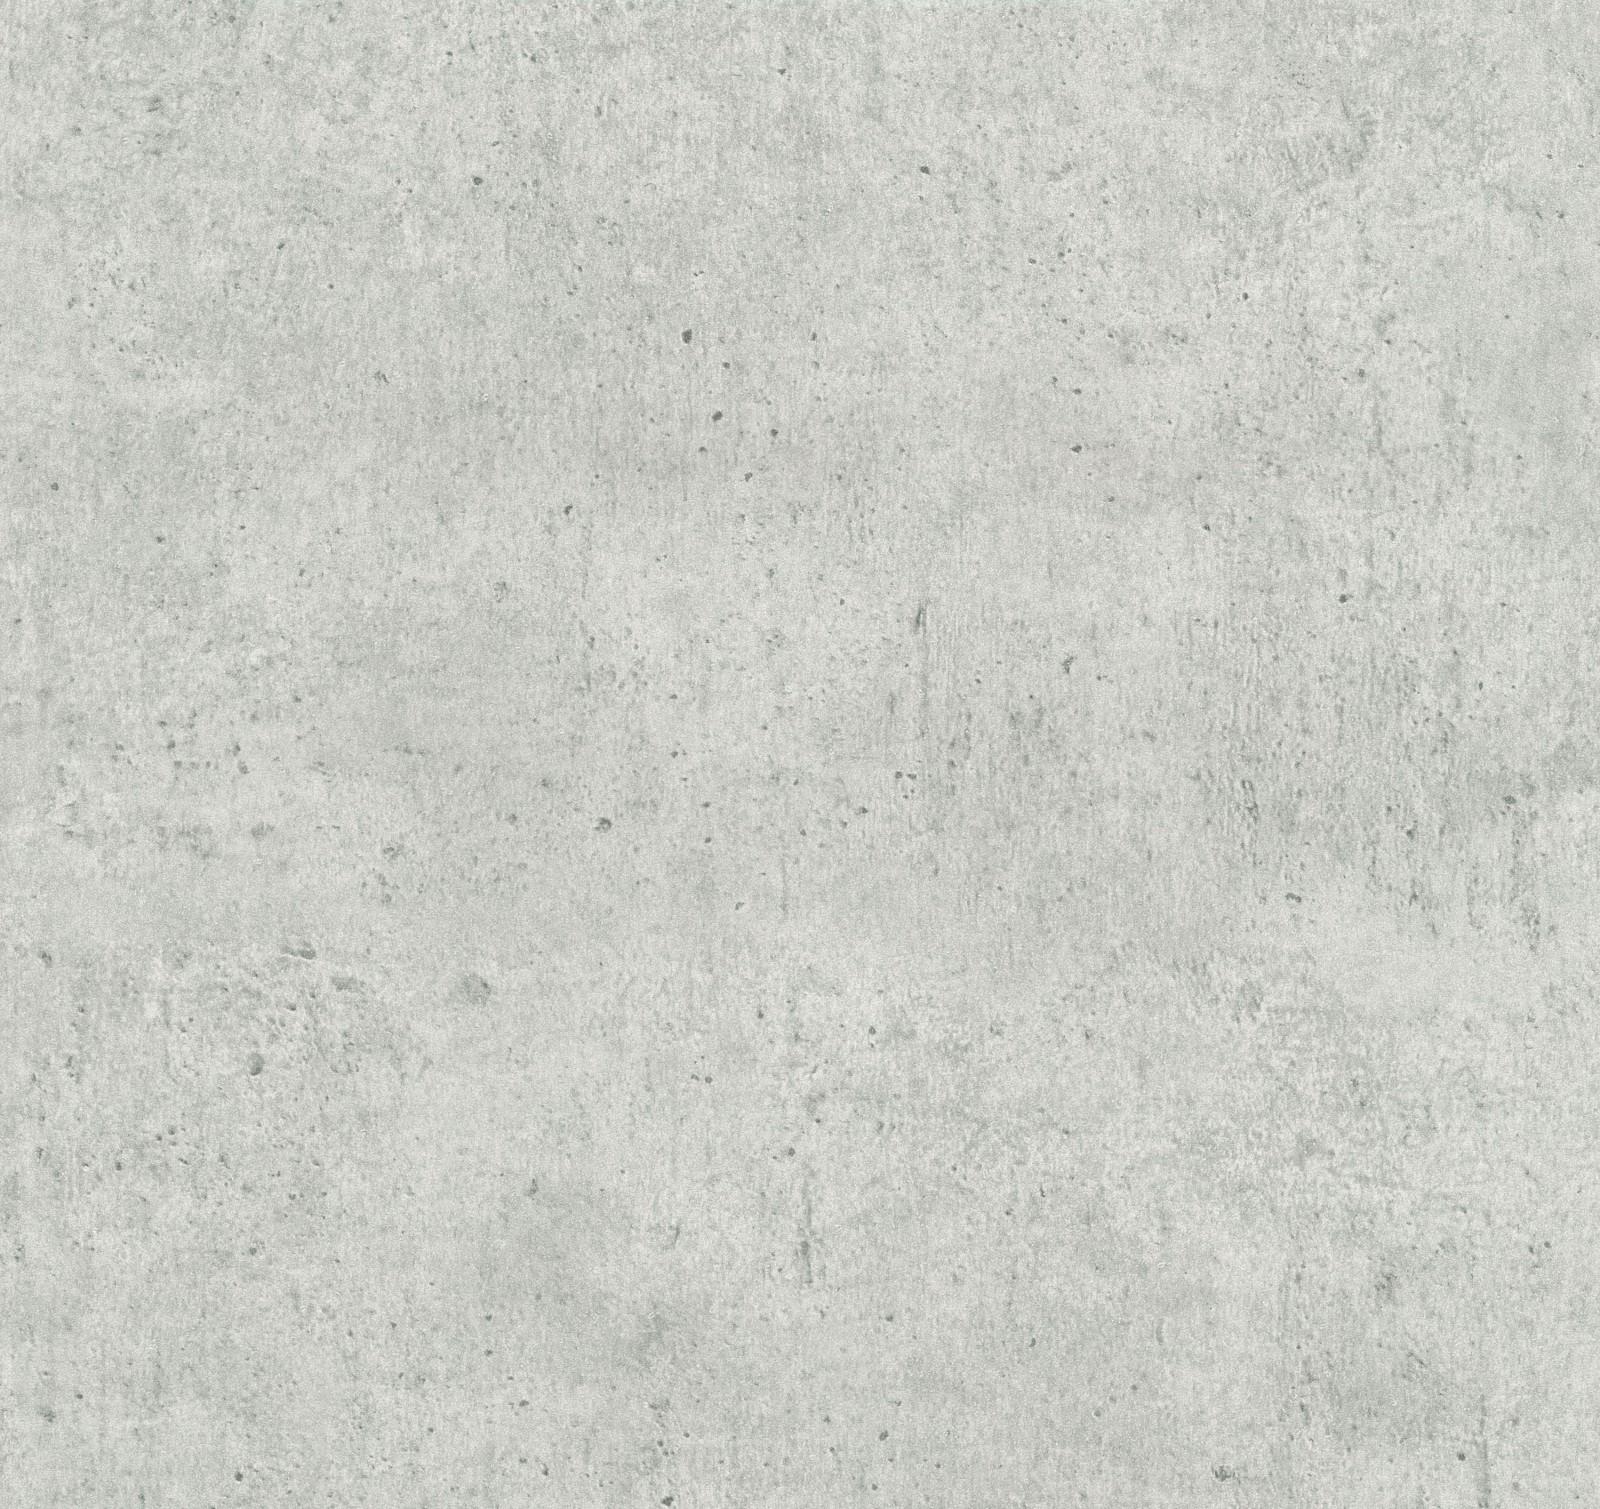 tapete guido maria kretschmer beton grau wei 02464 10. Black Bedroom Furniture Sets. Home Design Ideas